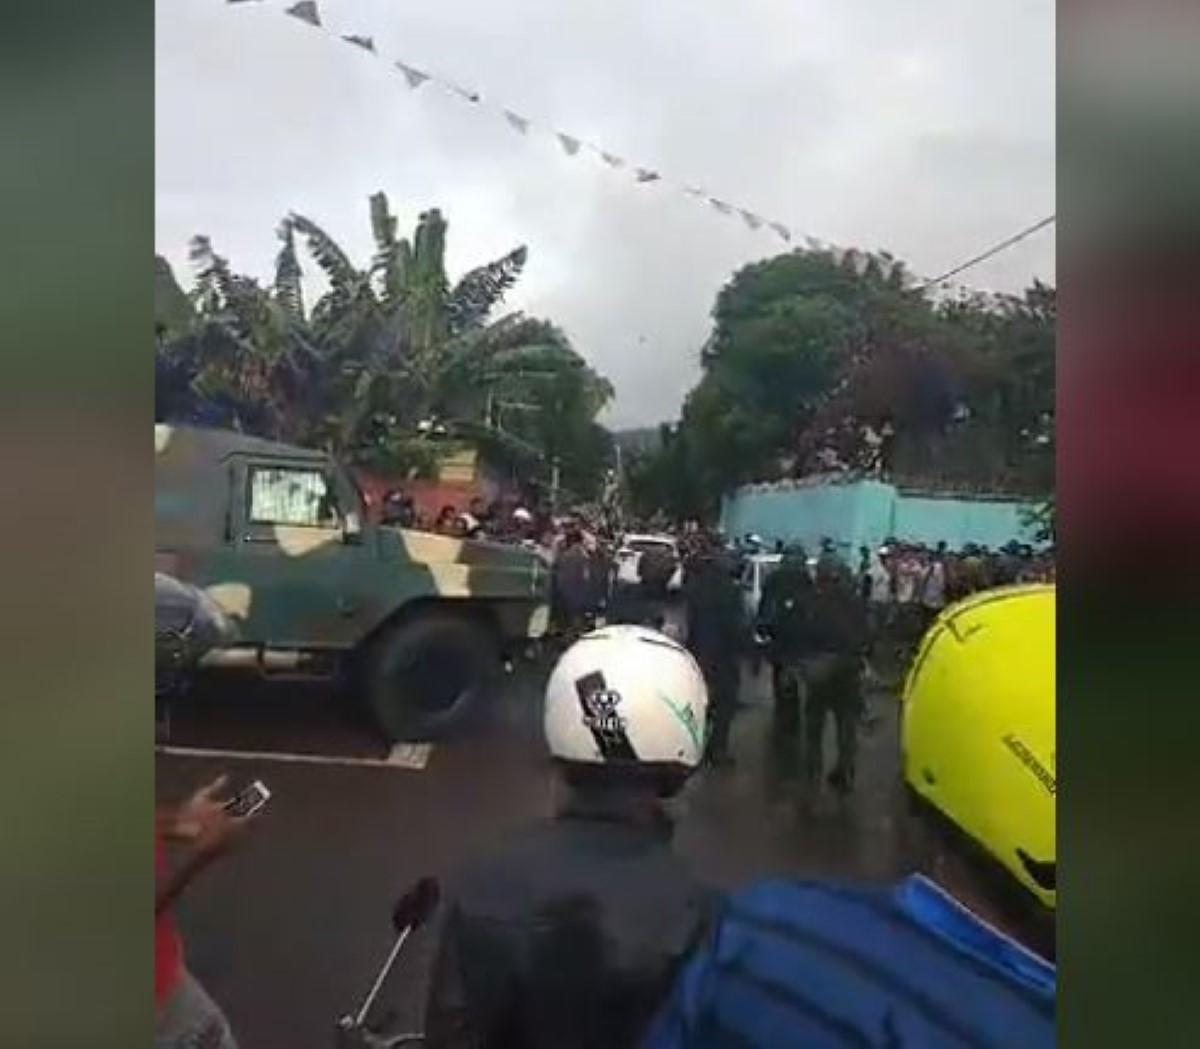 Karo Kalyptus, arrestations, saisie de drogue et tension